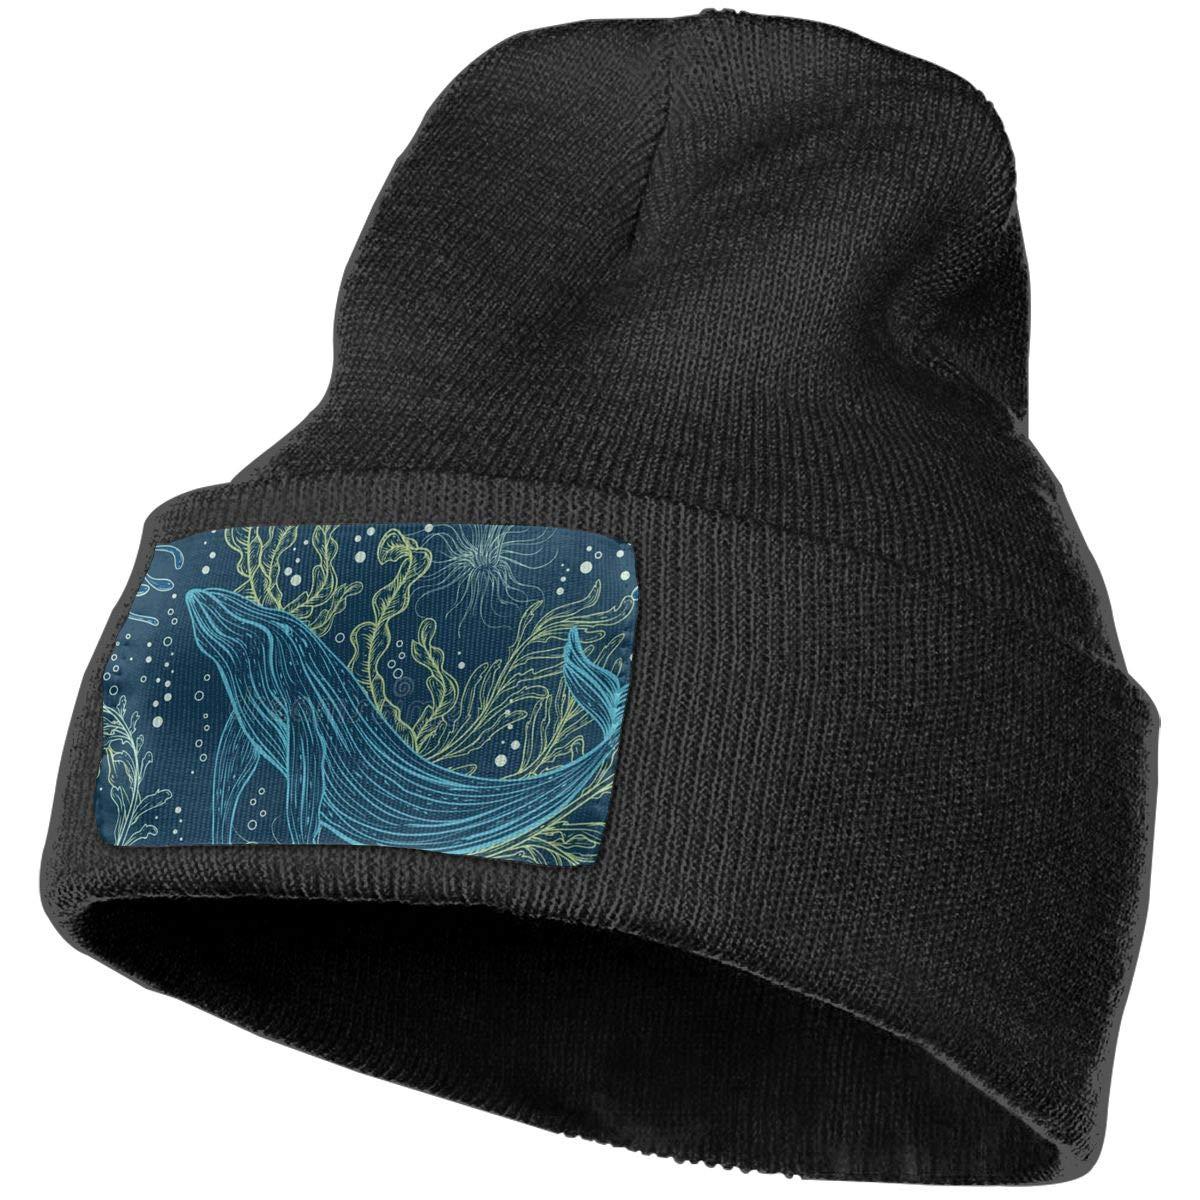 Ruin Blue Whale Fashion Knitting Hat for Men Women 100/% Acrylic Acid Mas Beanie Hat